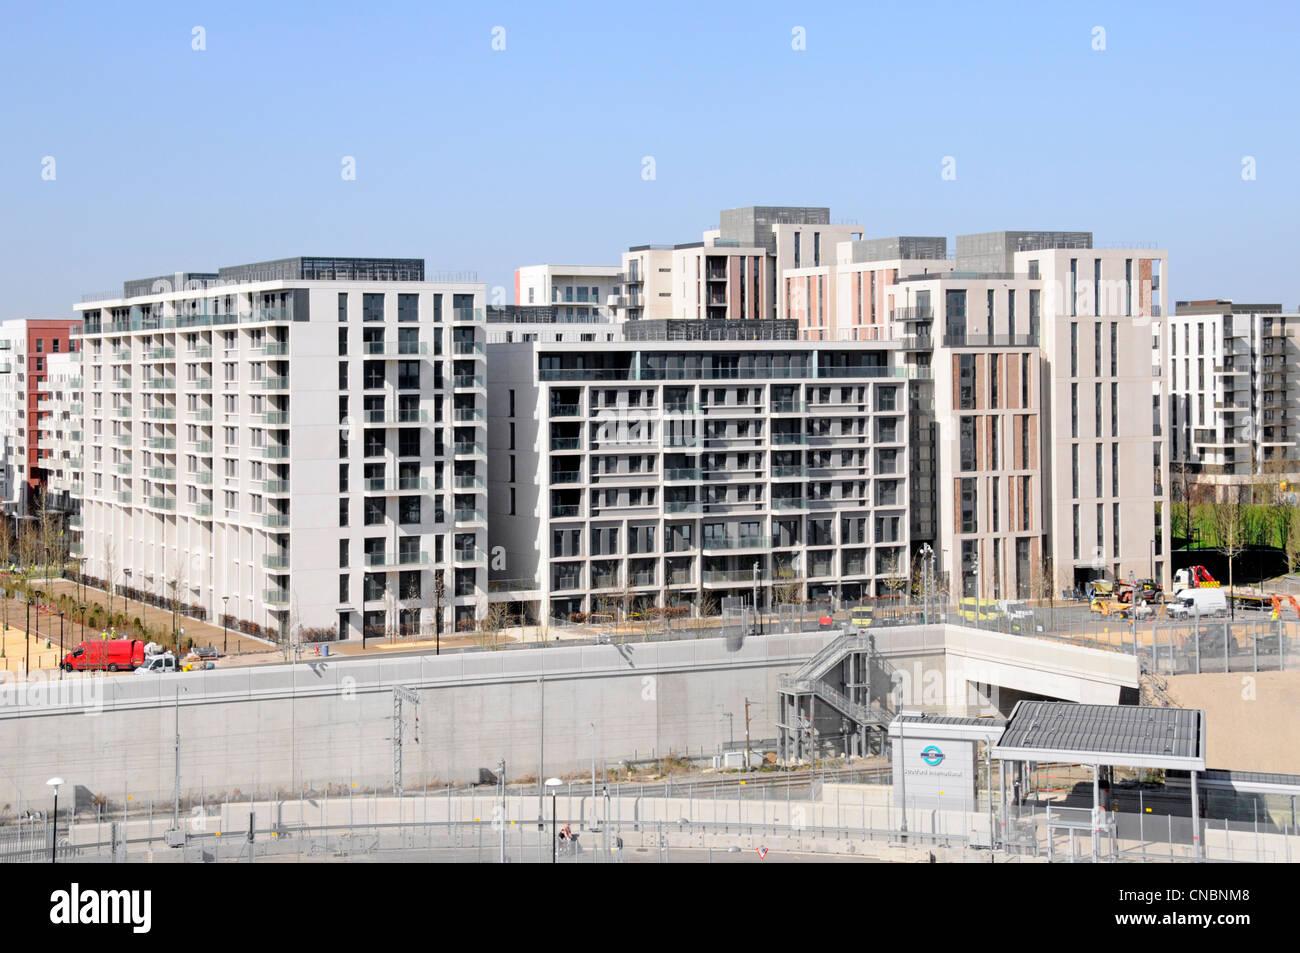 London 2012 Olympic athletes village nearing completion - Stock Image